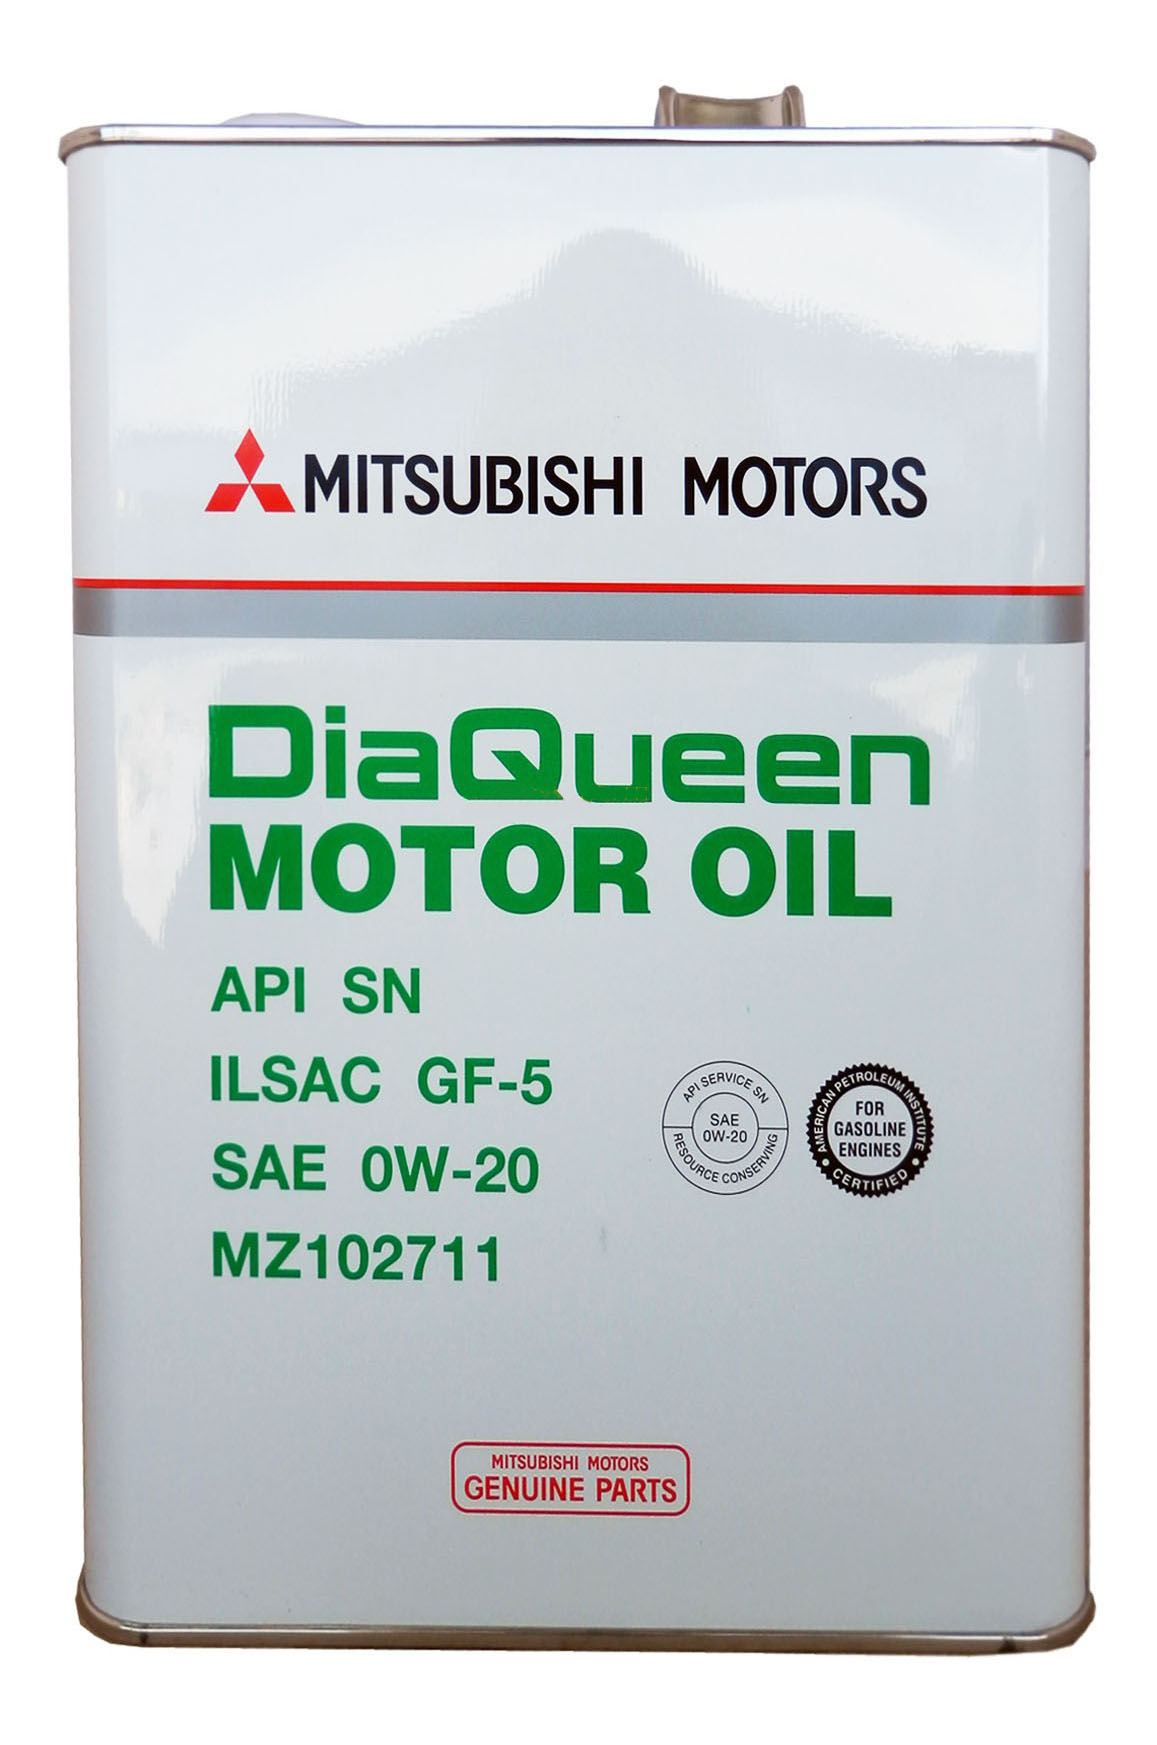 Моторное масло Mitsubishi Dia Queen Motor